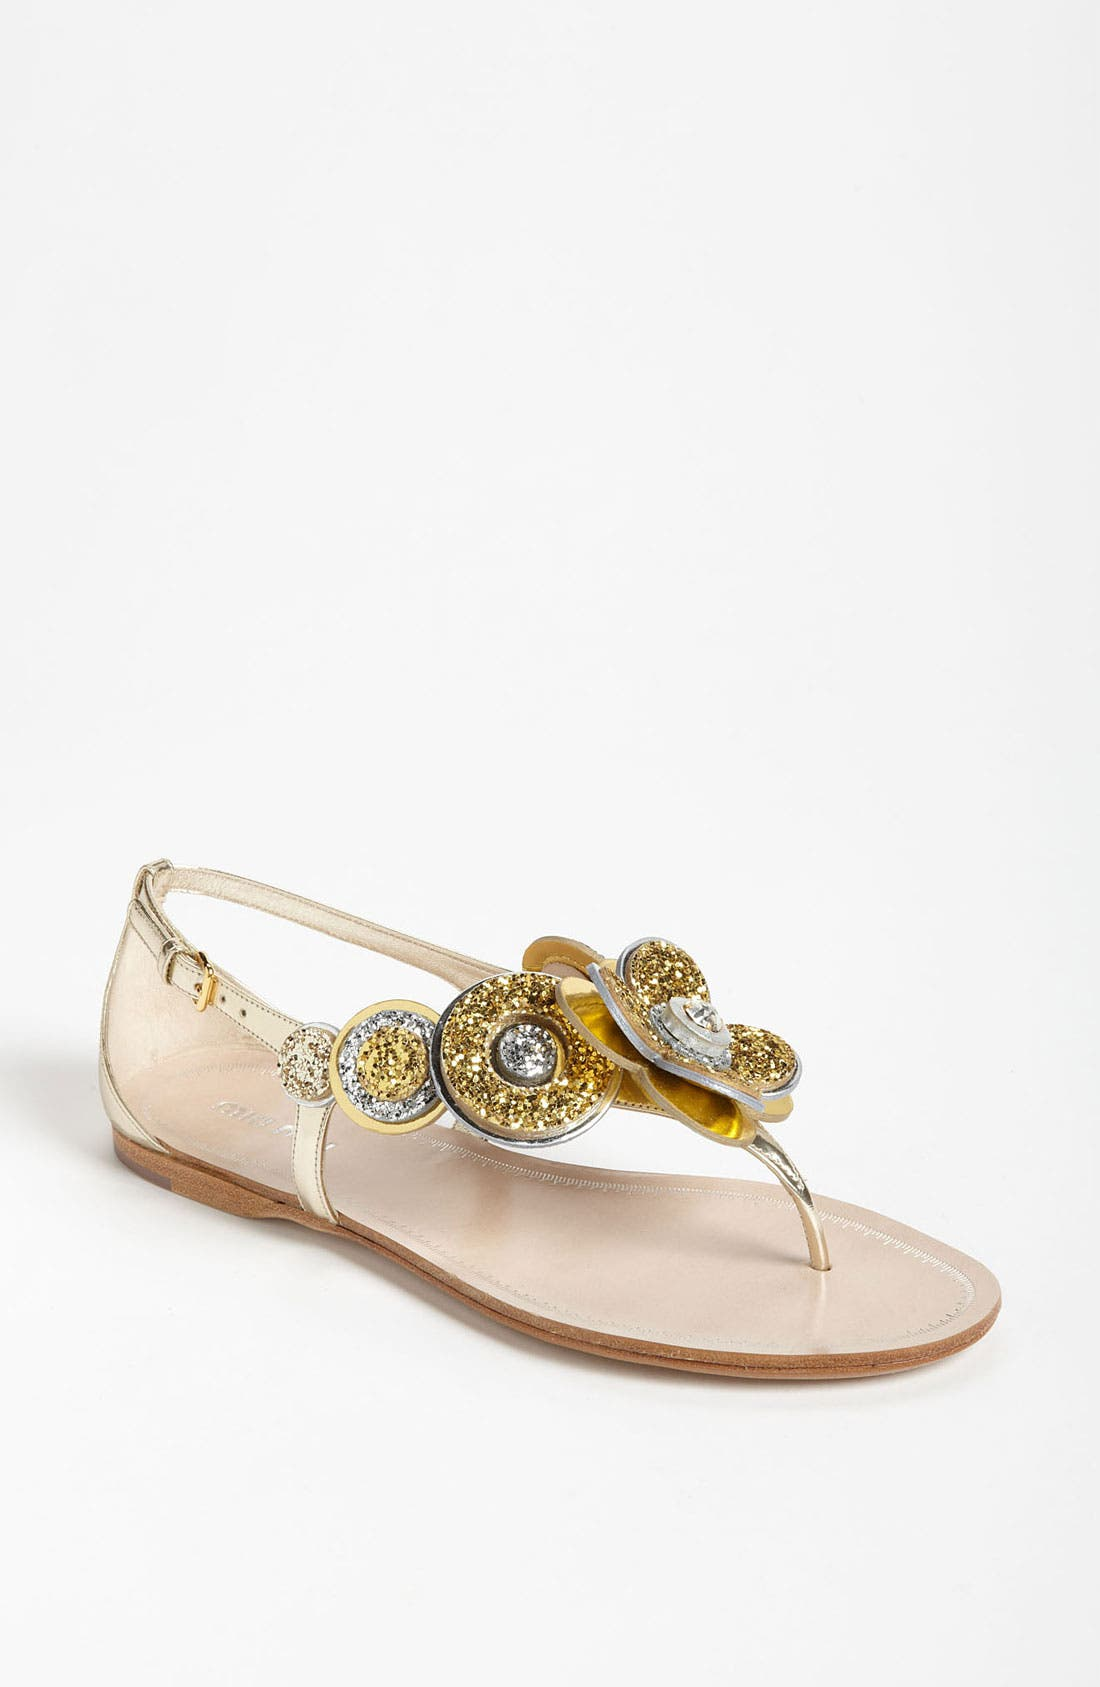 Main Image - Miu Miu Flower Thong Sandal